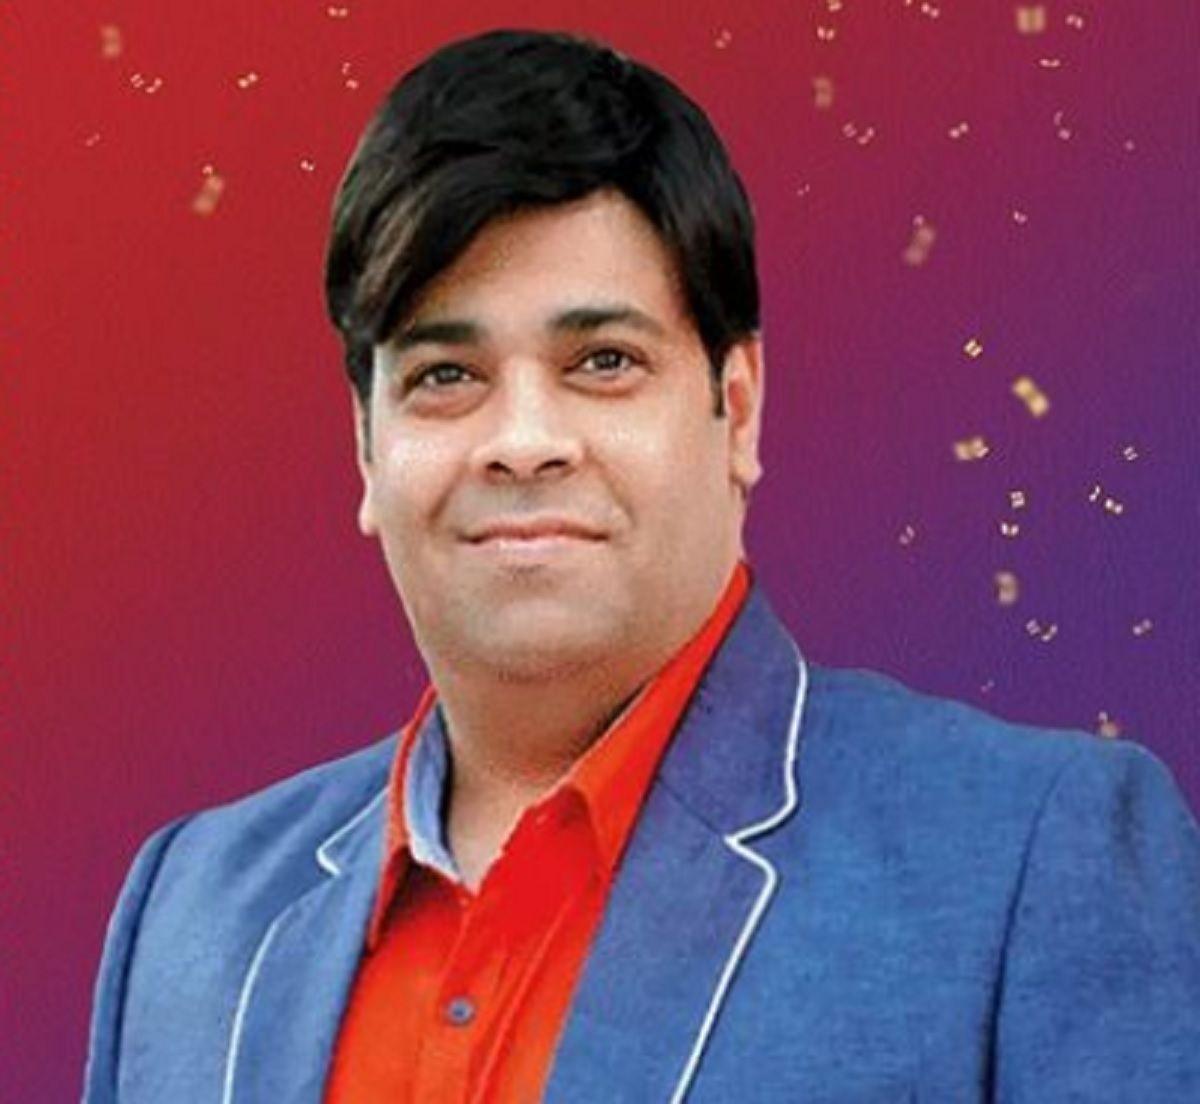 Kiku Sharda net worth films and property